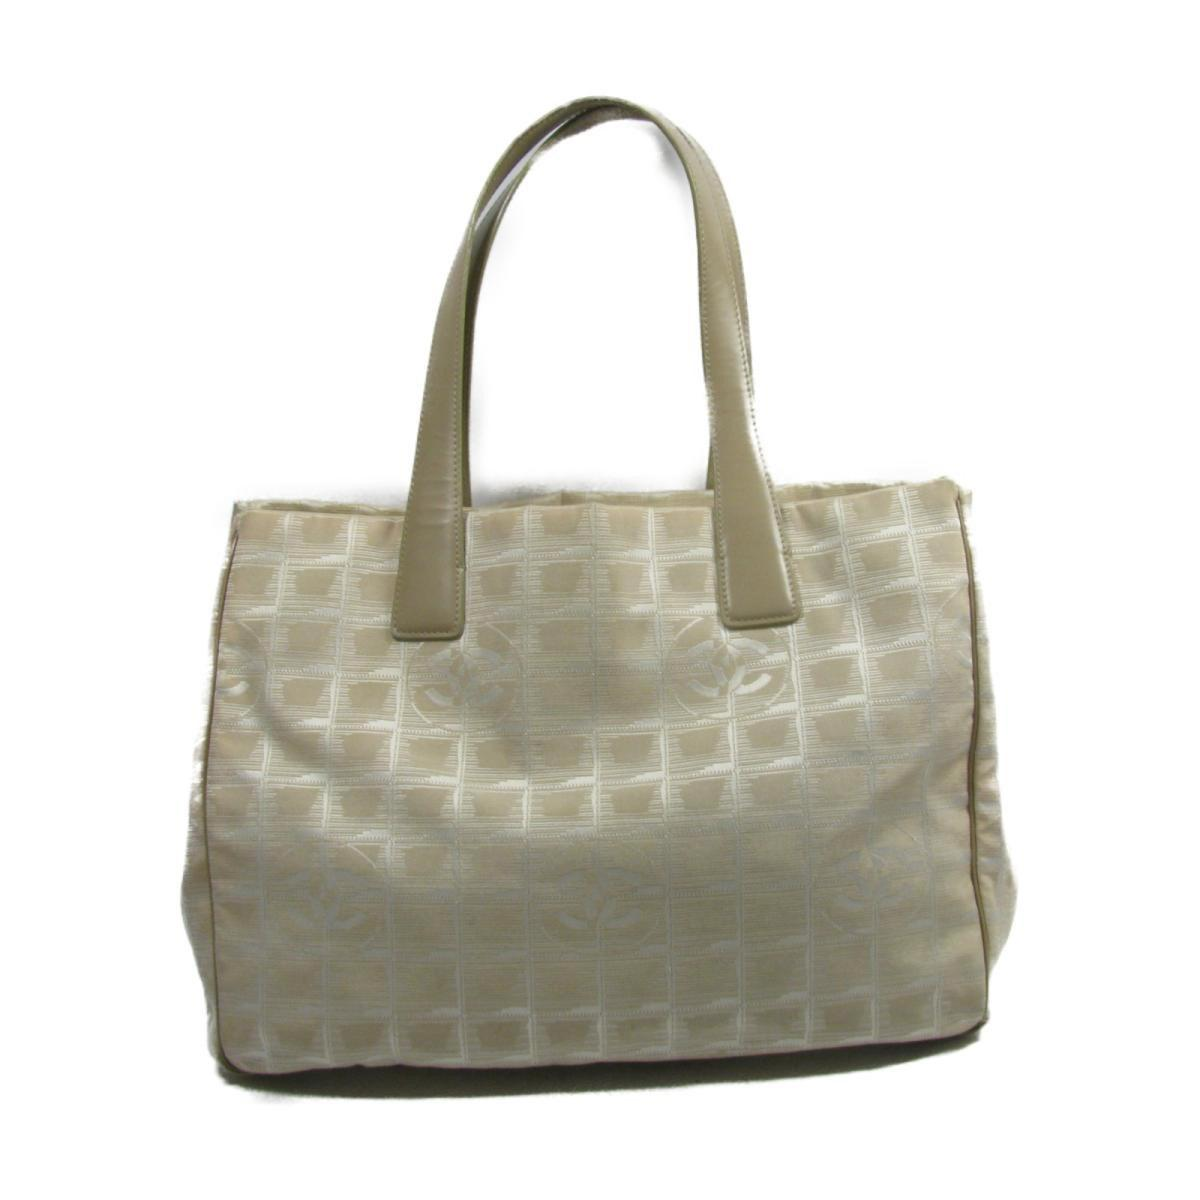 84c6795444c7 Chanel Authentic New Travel Line Mm Tote Bag Nylon Jacquard Beige ...